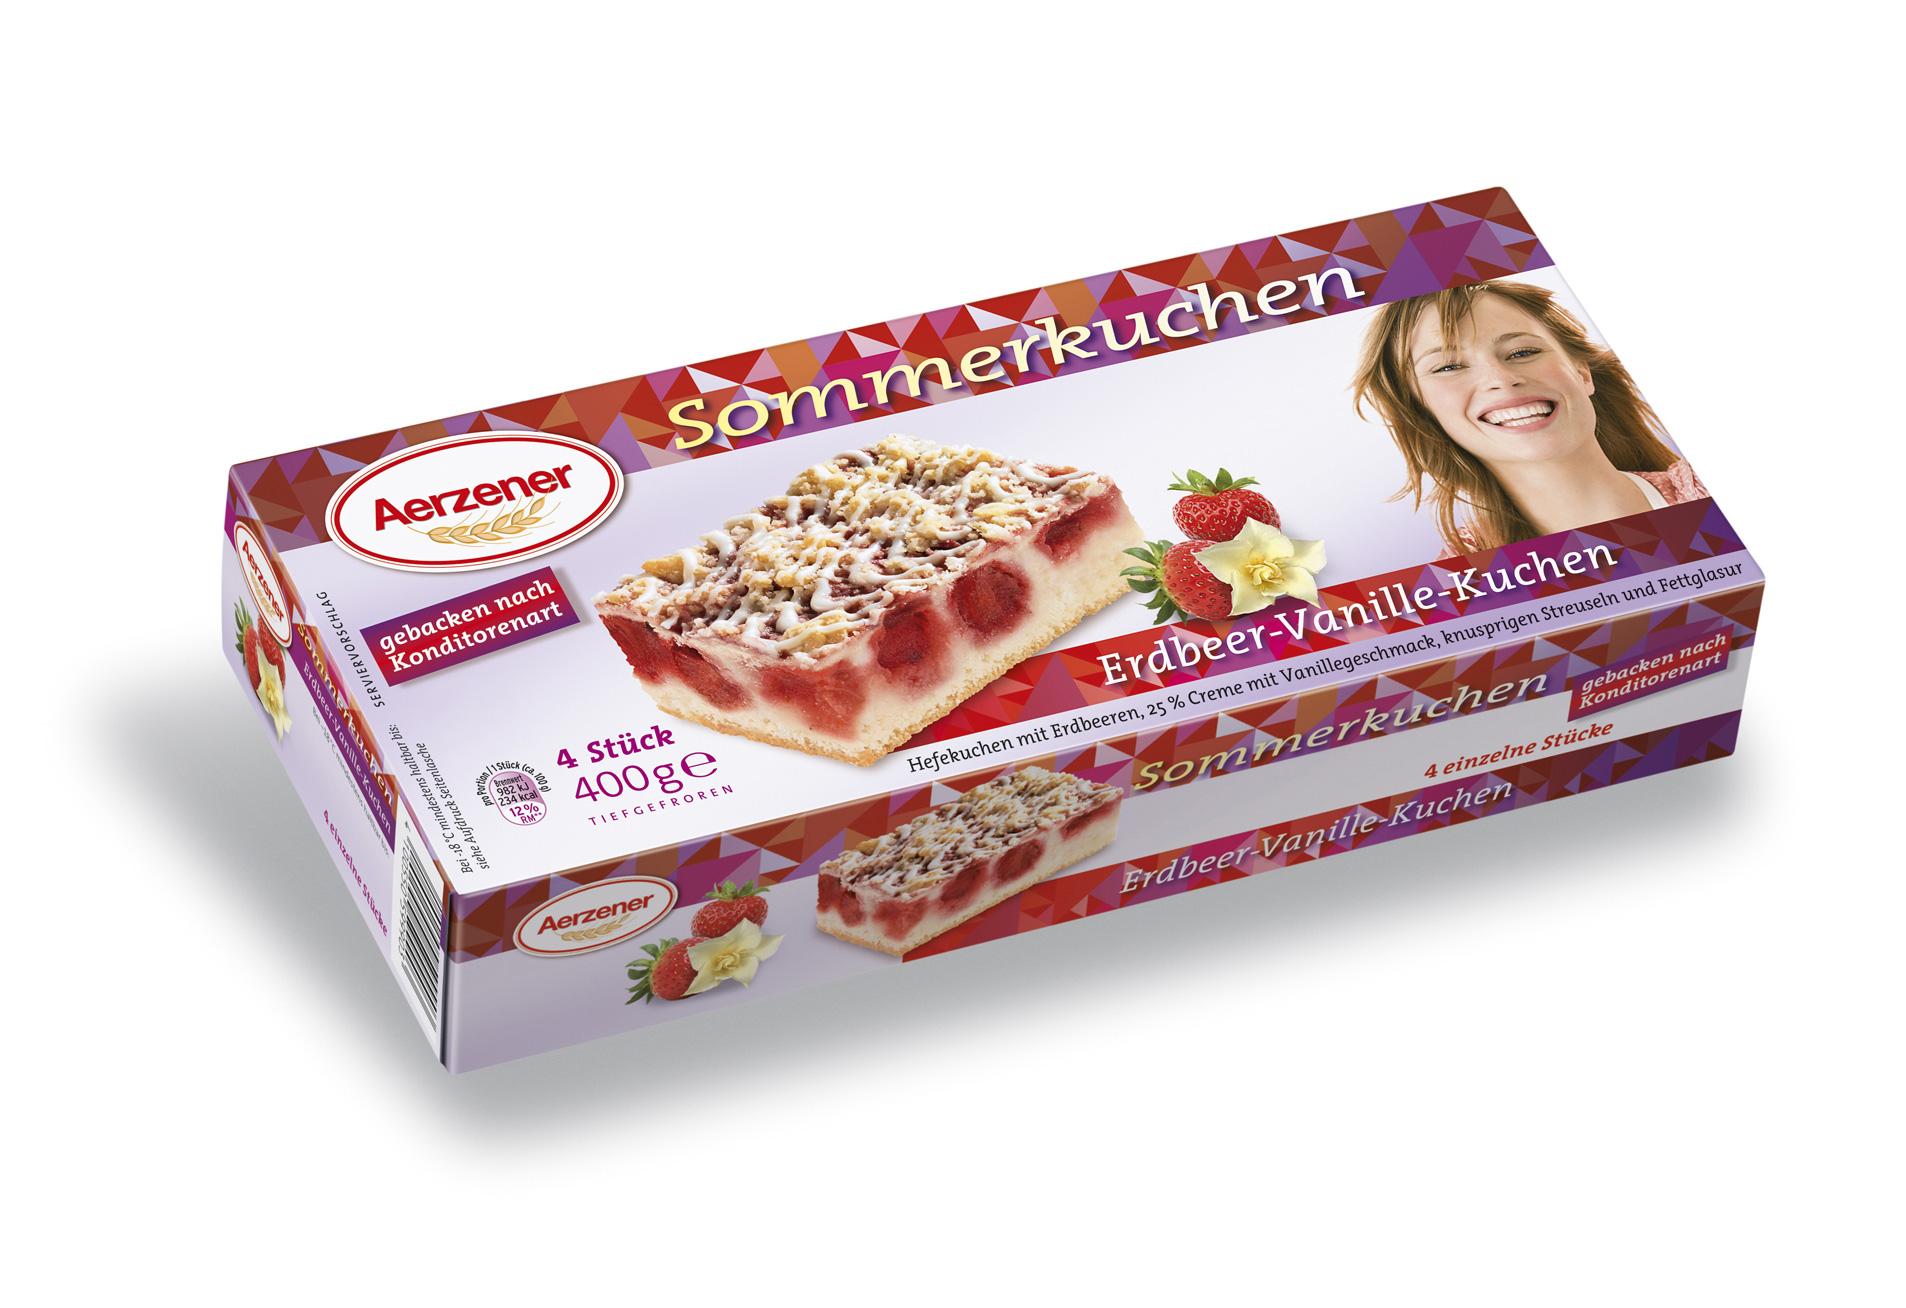 Aerzener Brot Erdbeer Vanille Kuchen